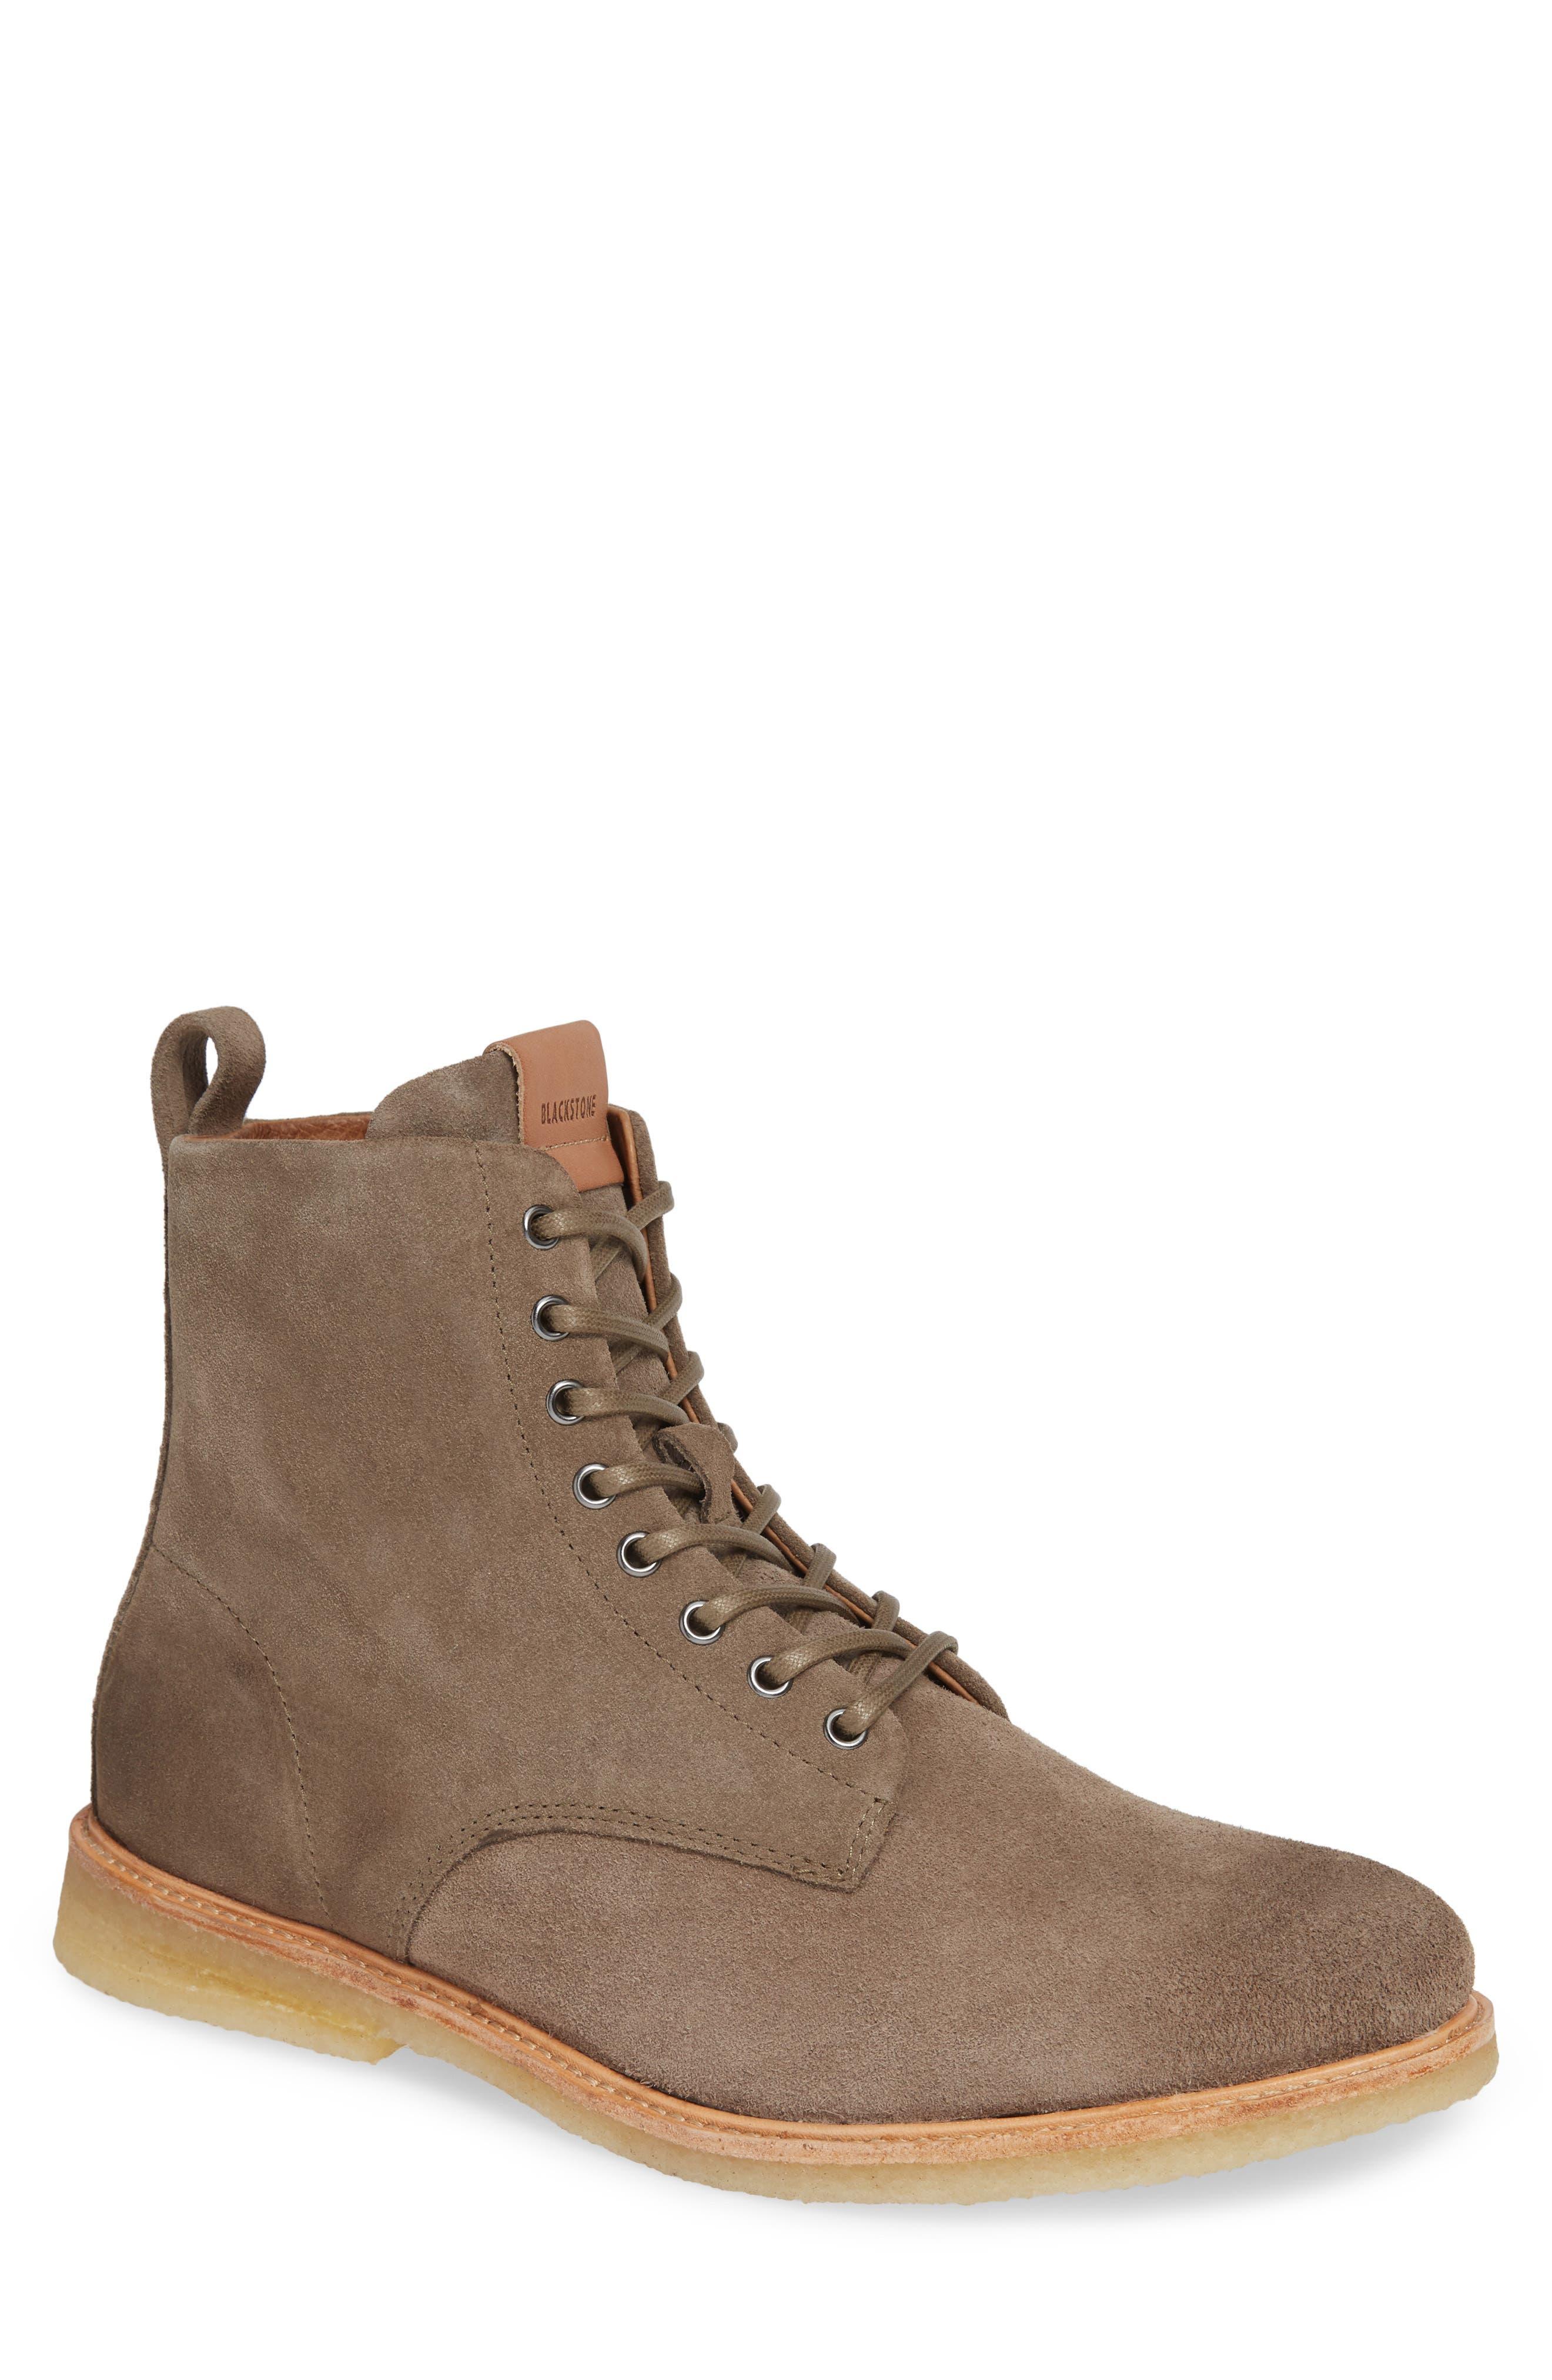 QM23 Plain Toe Boot,                             Main thumbnail 1, color,                             GREY